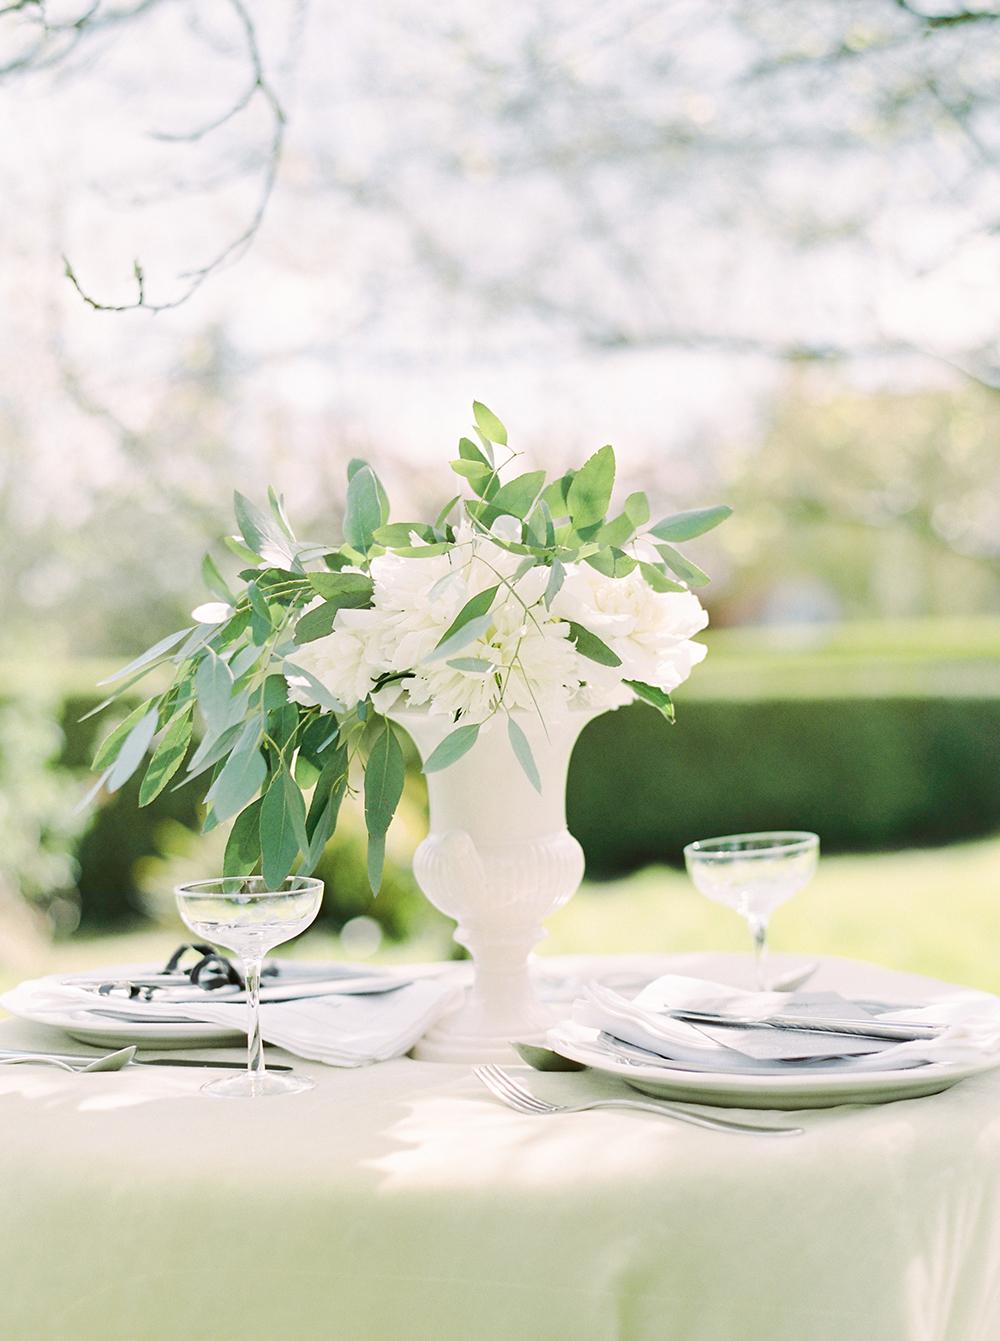 wedding centrepiece, wedding centerpiece,white peony centrepiece,